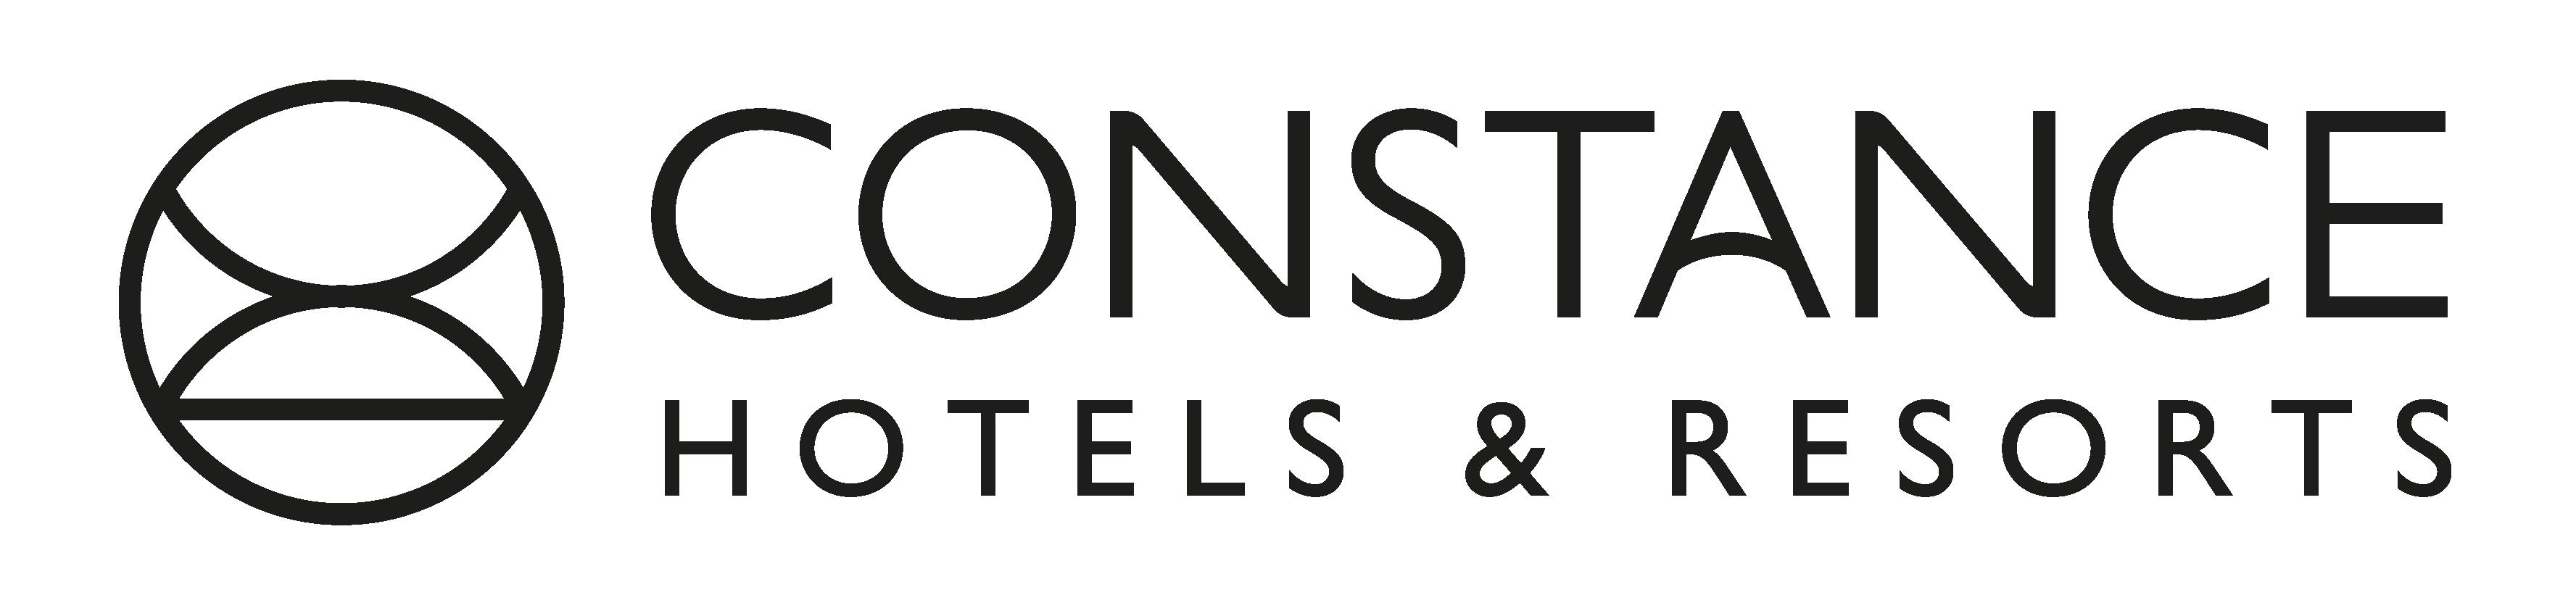 EXE_LOGO_CONSTANCE-HOTELS & RESORTS_HORIZONTAL_NOIR_RVB